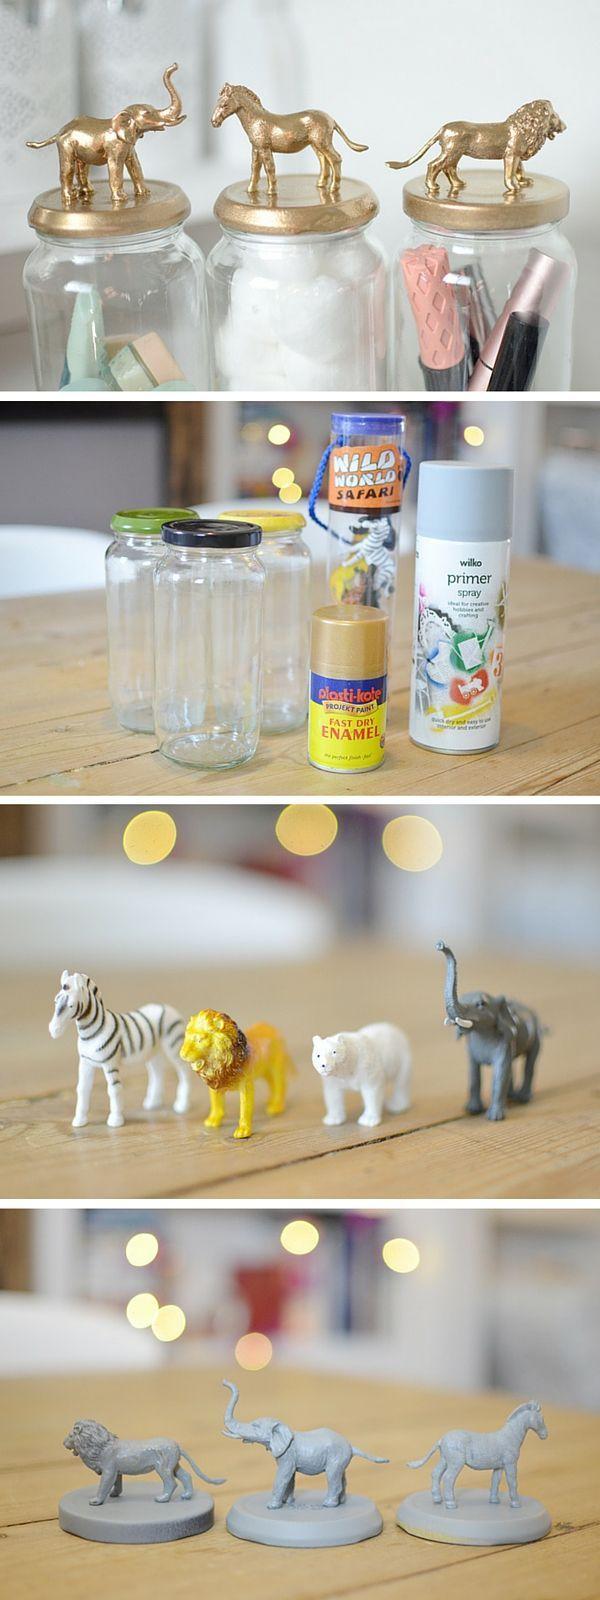 Easy Home Decorating Ideas Pinterest